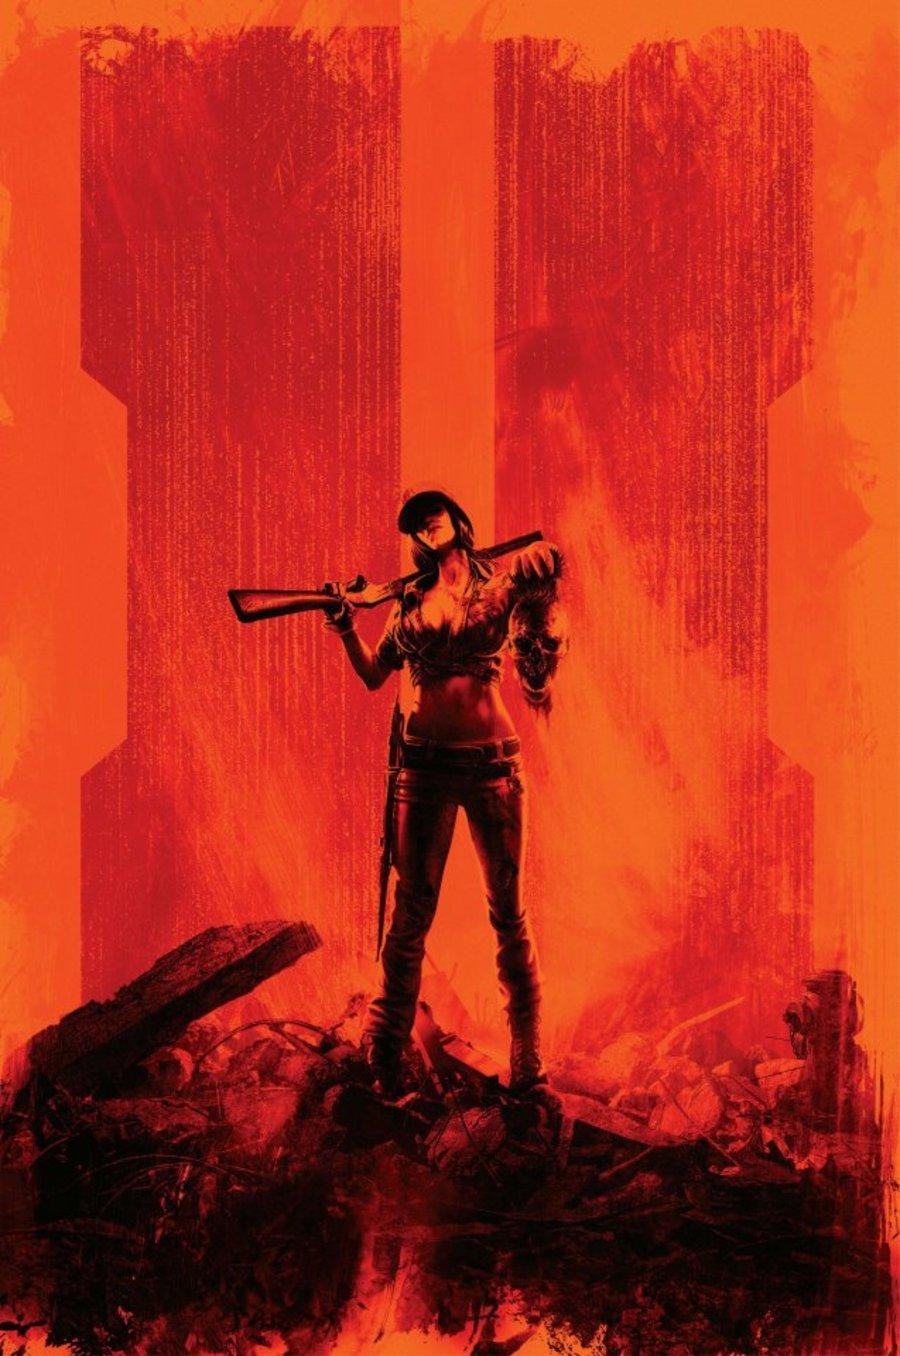 Арт к игре Call of Duty: Black Ops II